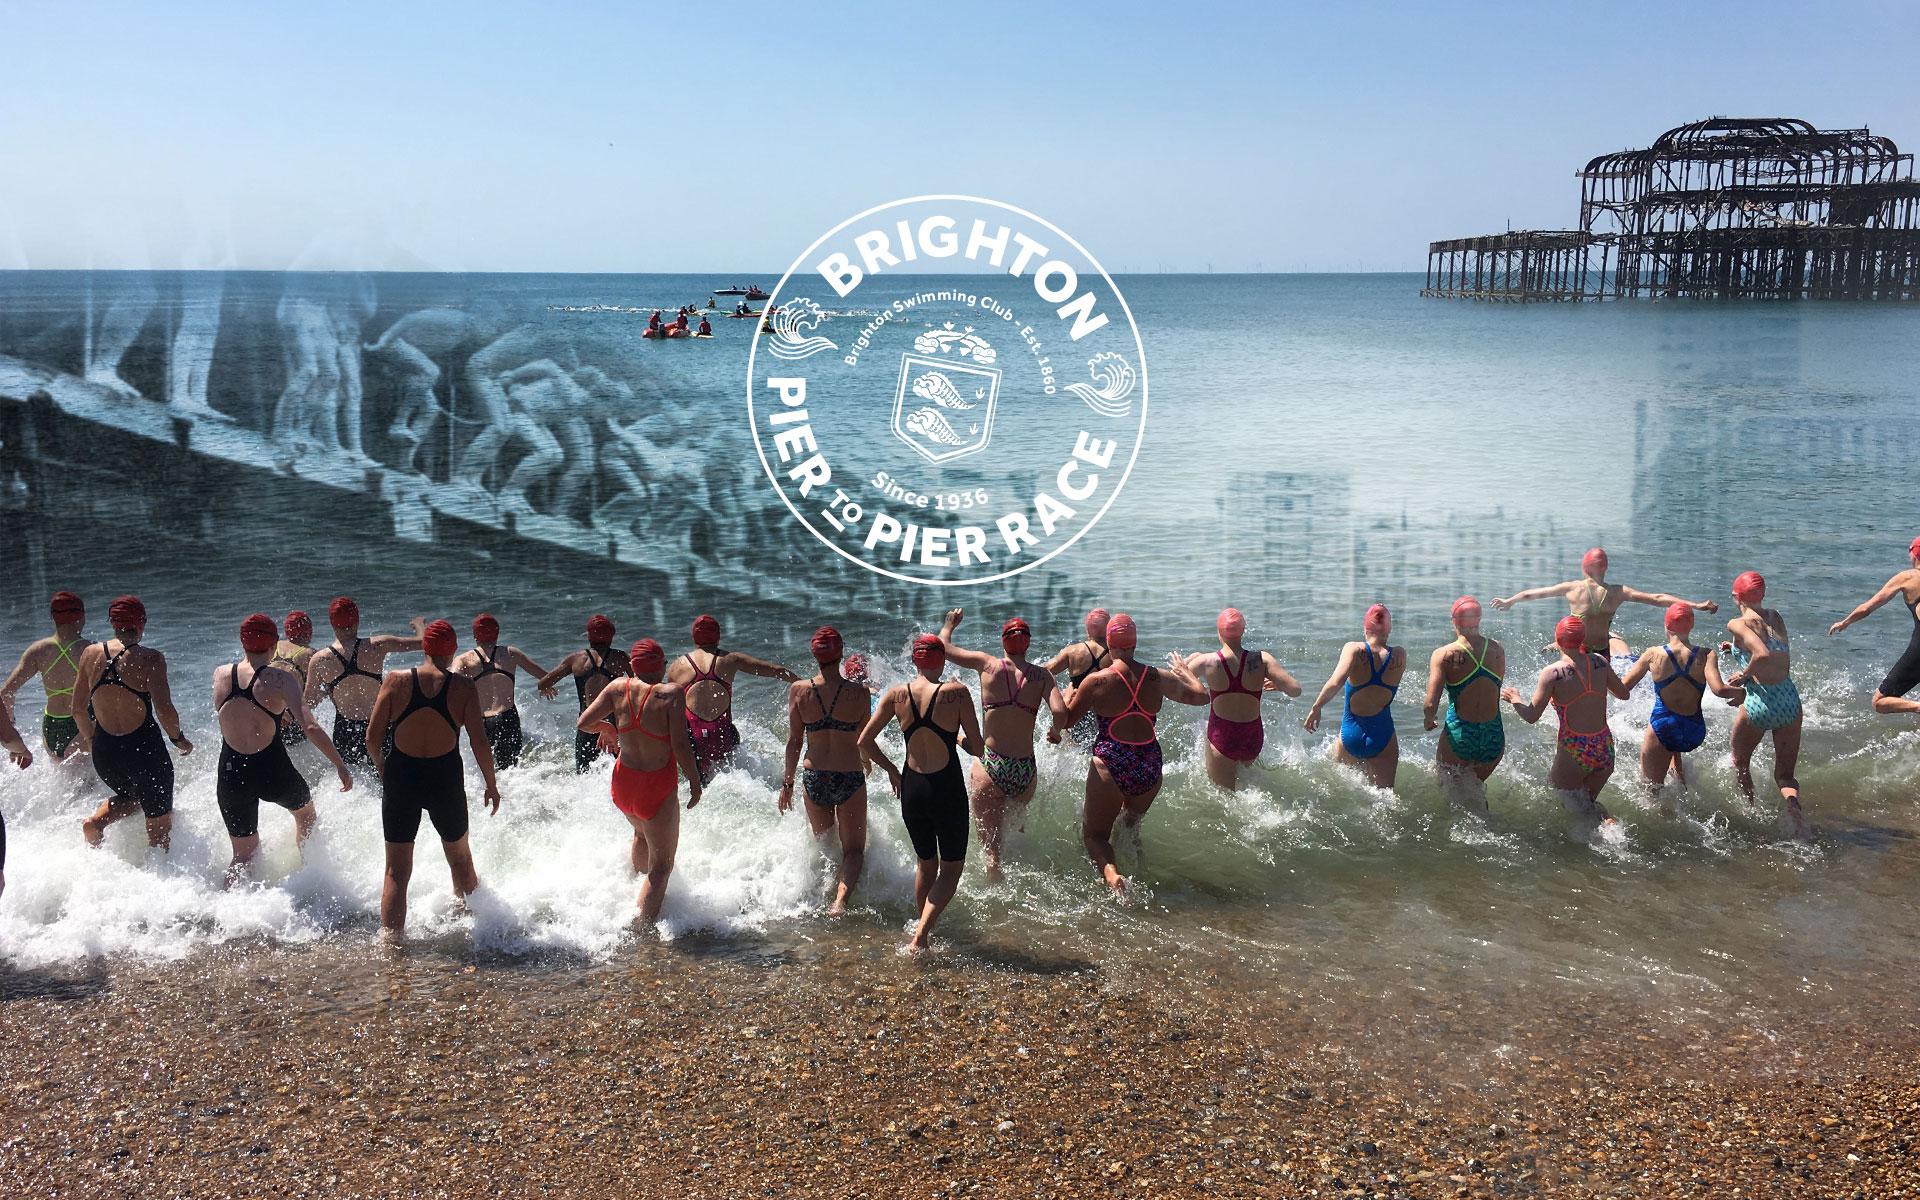 Brighton Pier 2 Pier